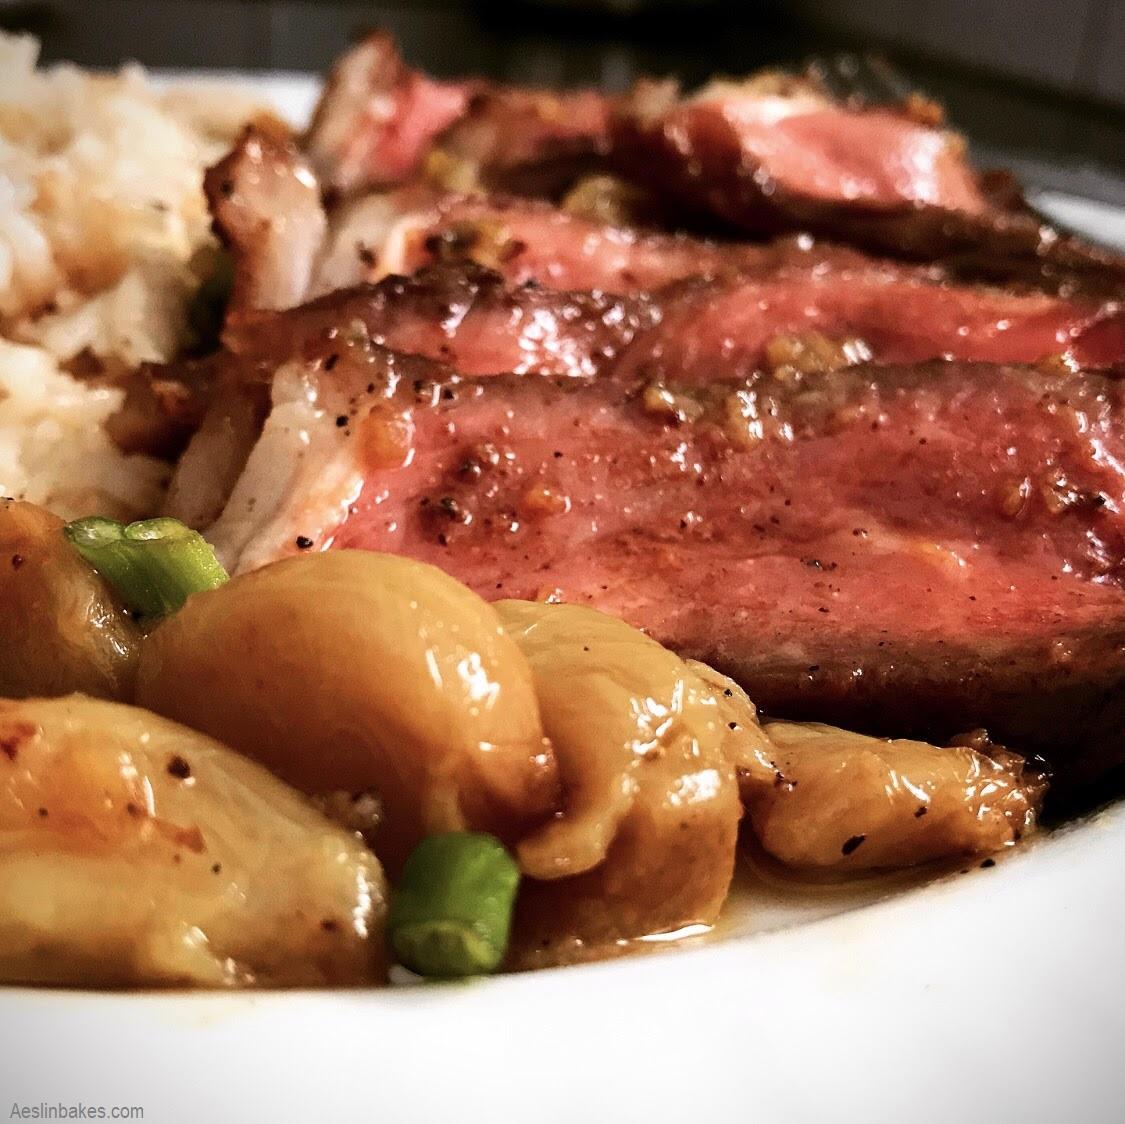 Reverse-Seared Steak with Roasted Garlic